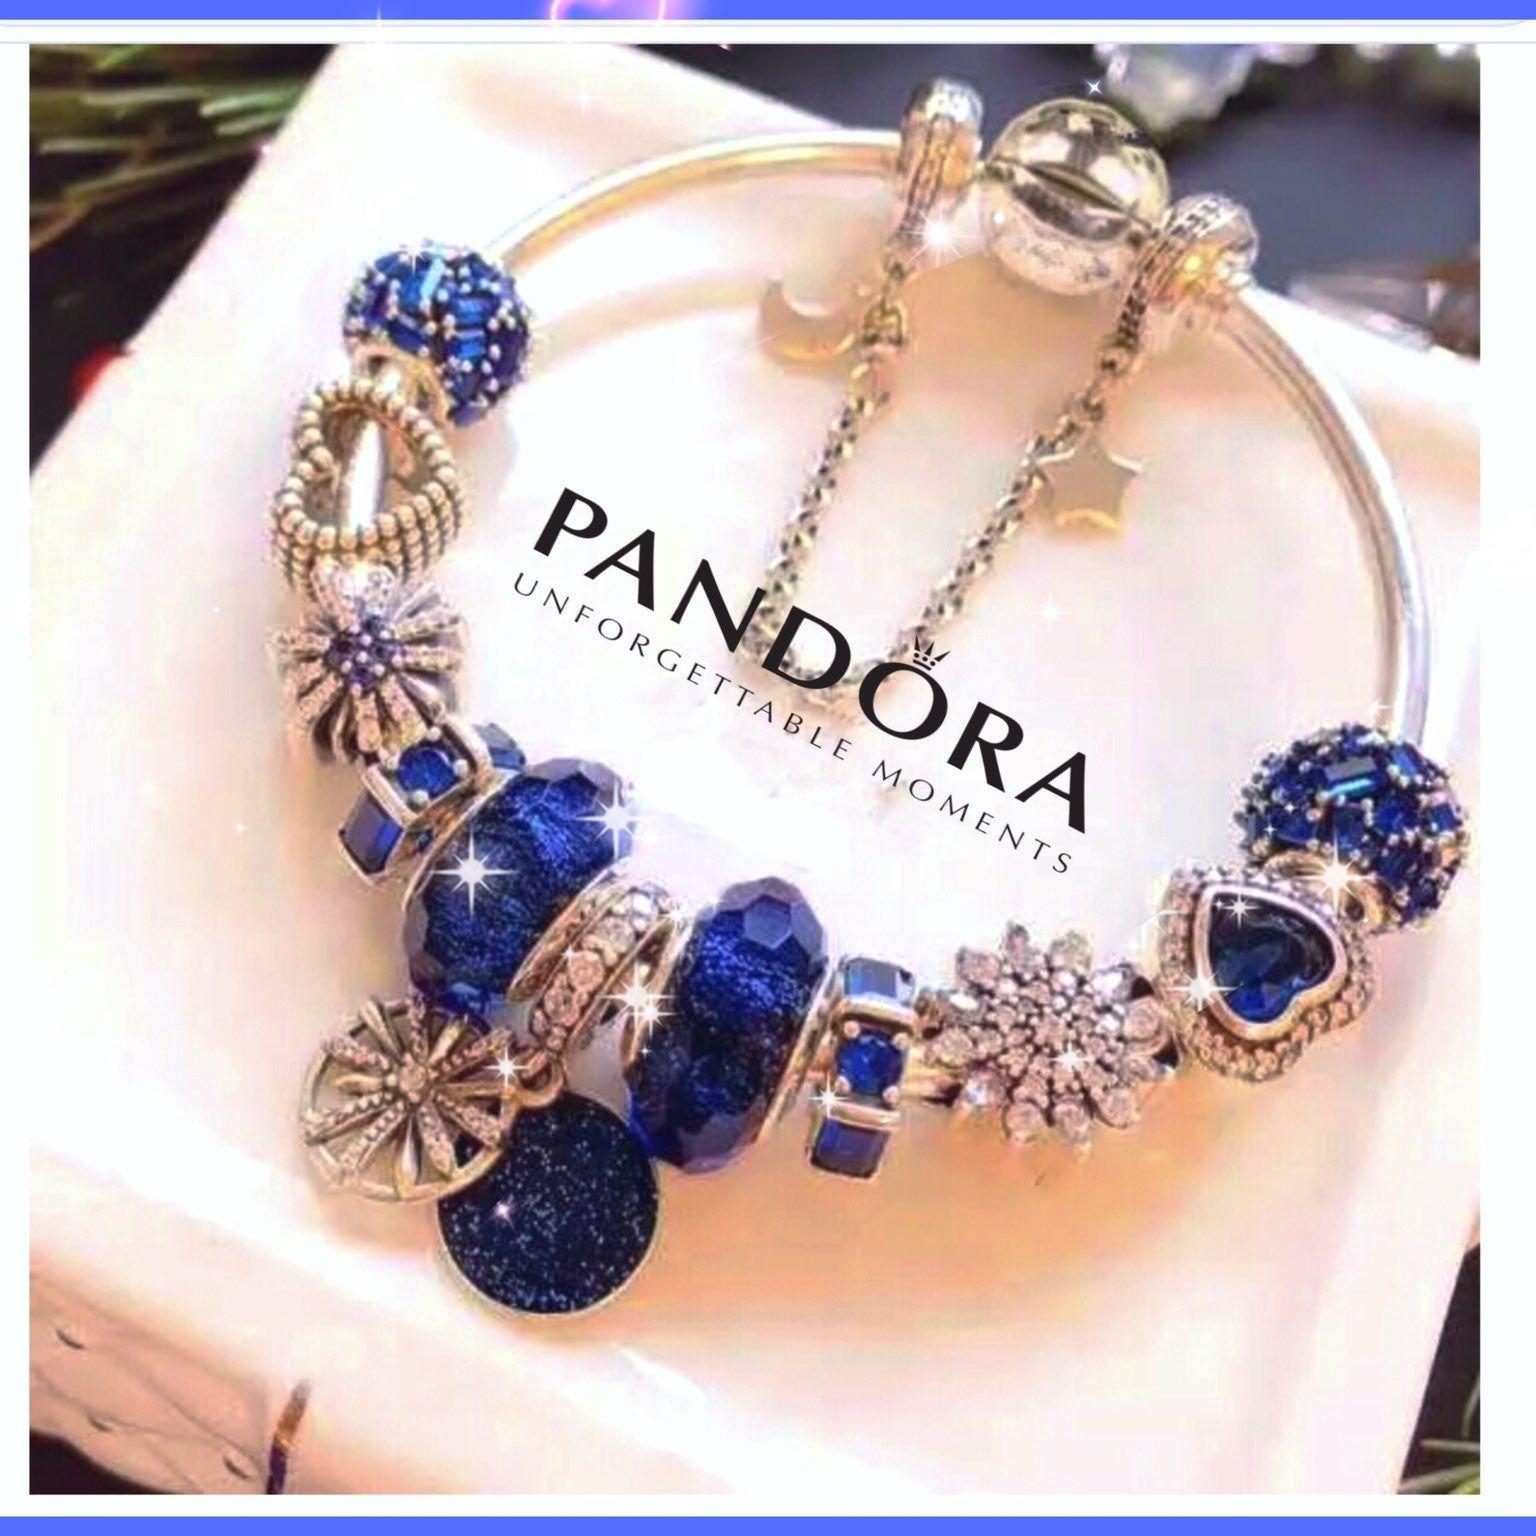 Pandora 925 Sterling Silver Bangle With 11 Pandora 925 Sterling Silver Cz Charms Set Size 7 Pandora Bracelet Designs Pandora Jewelry Pandora Jewelry Bracelets